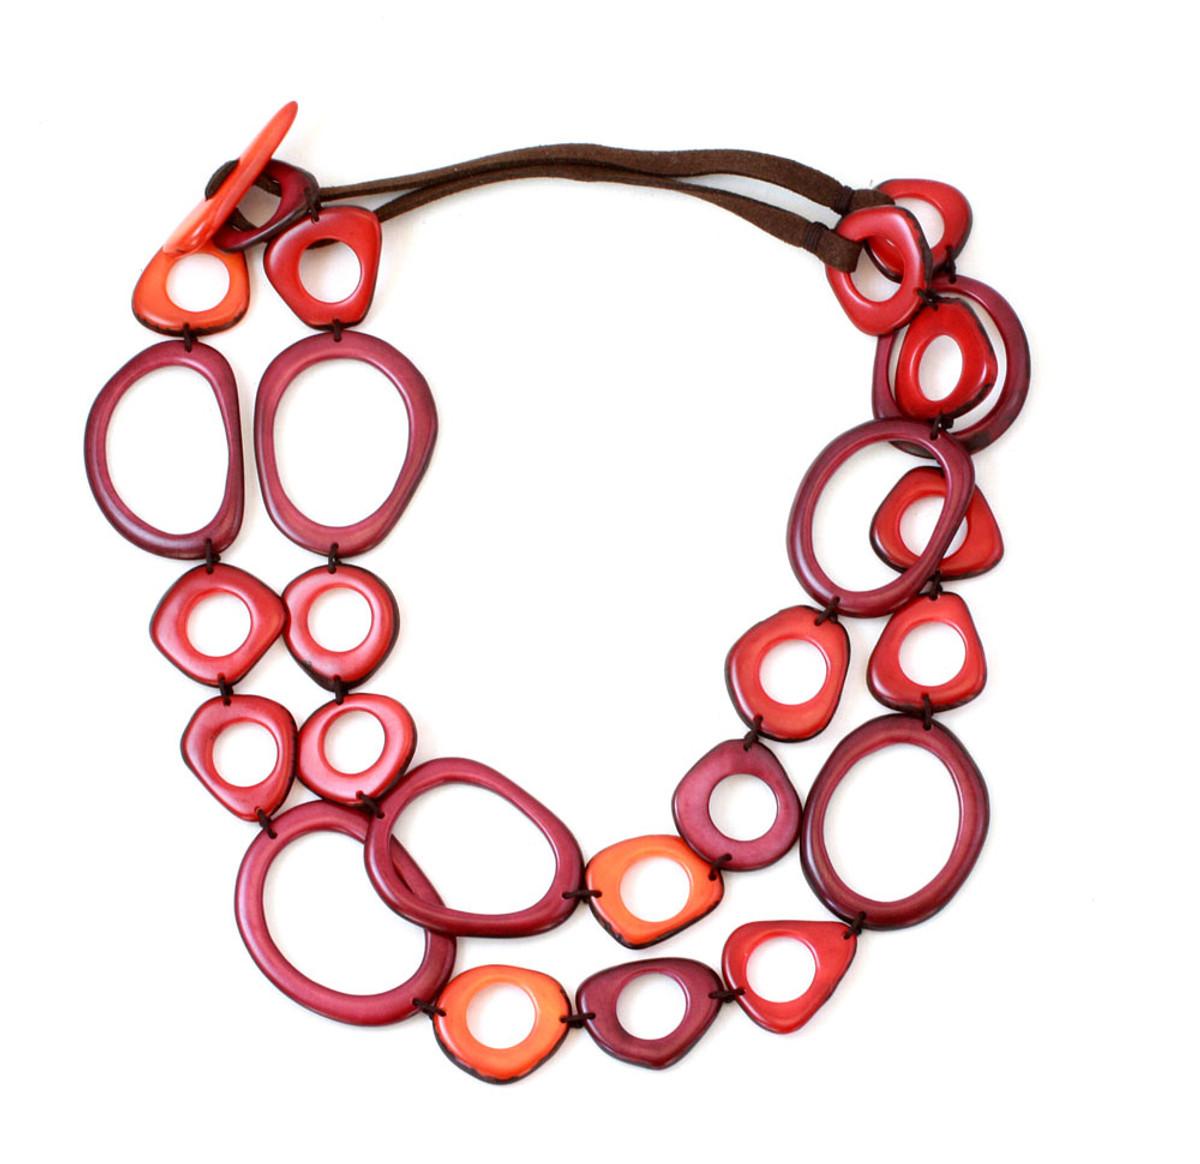 Encanto Red Ada Sunset Necklace